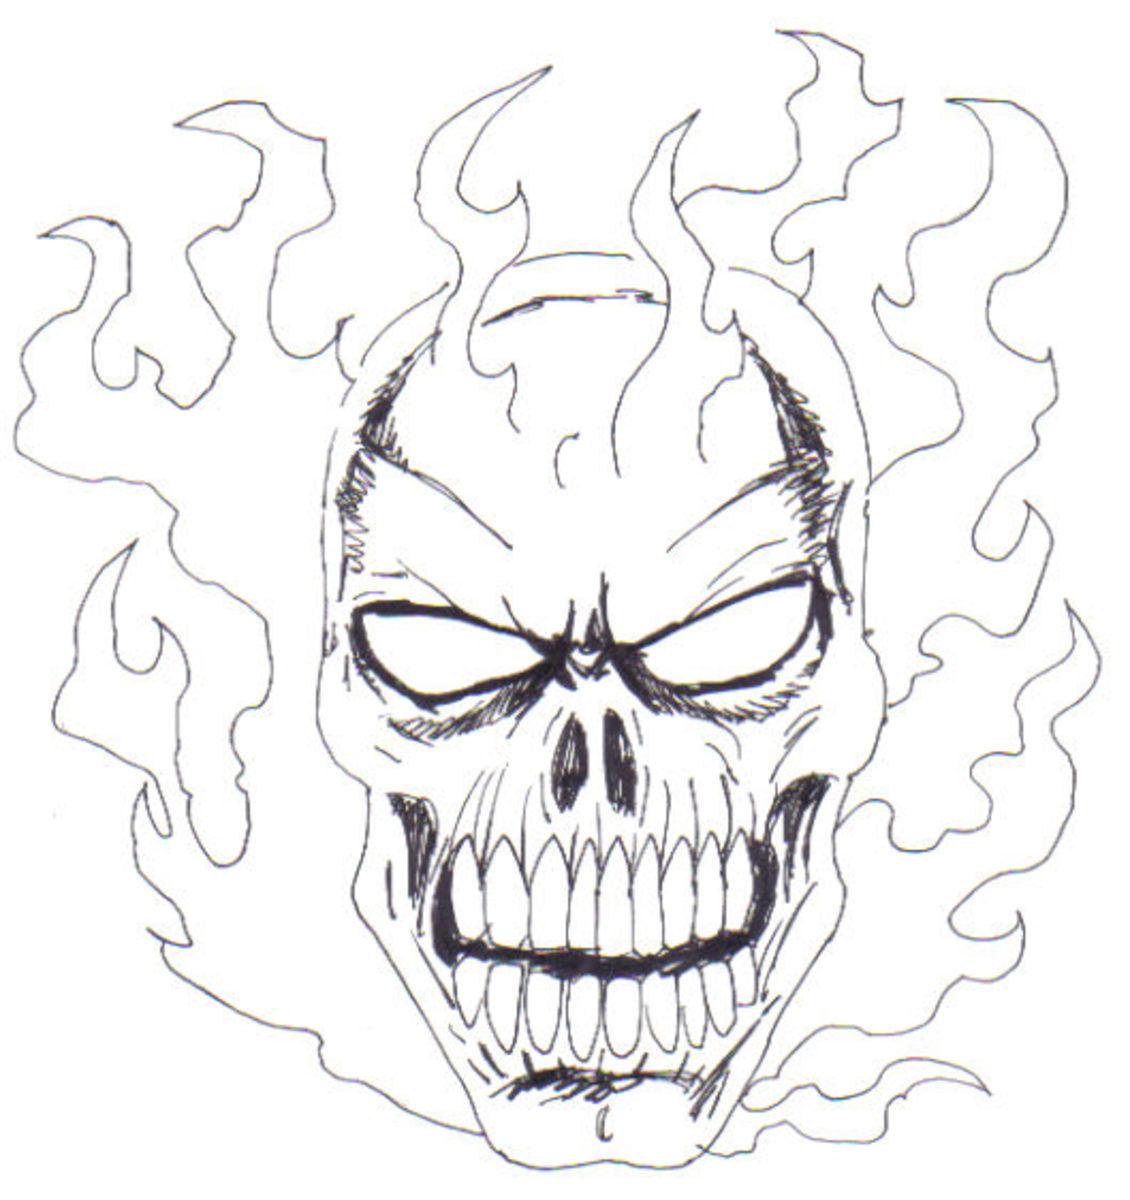 Flaming Skull Drawings